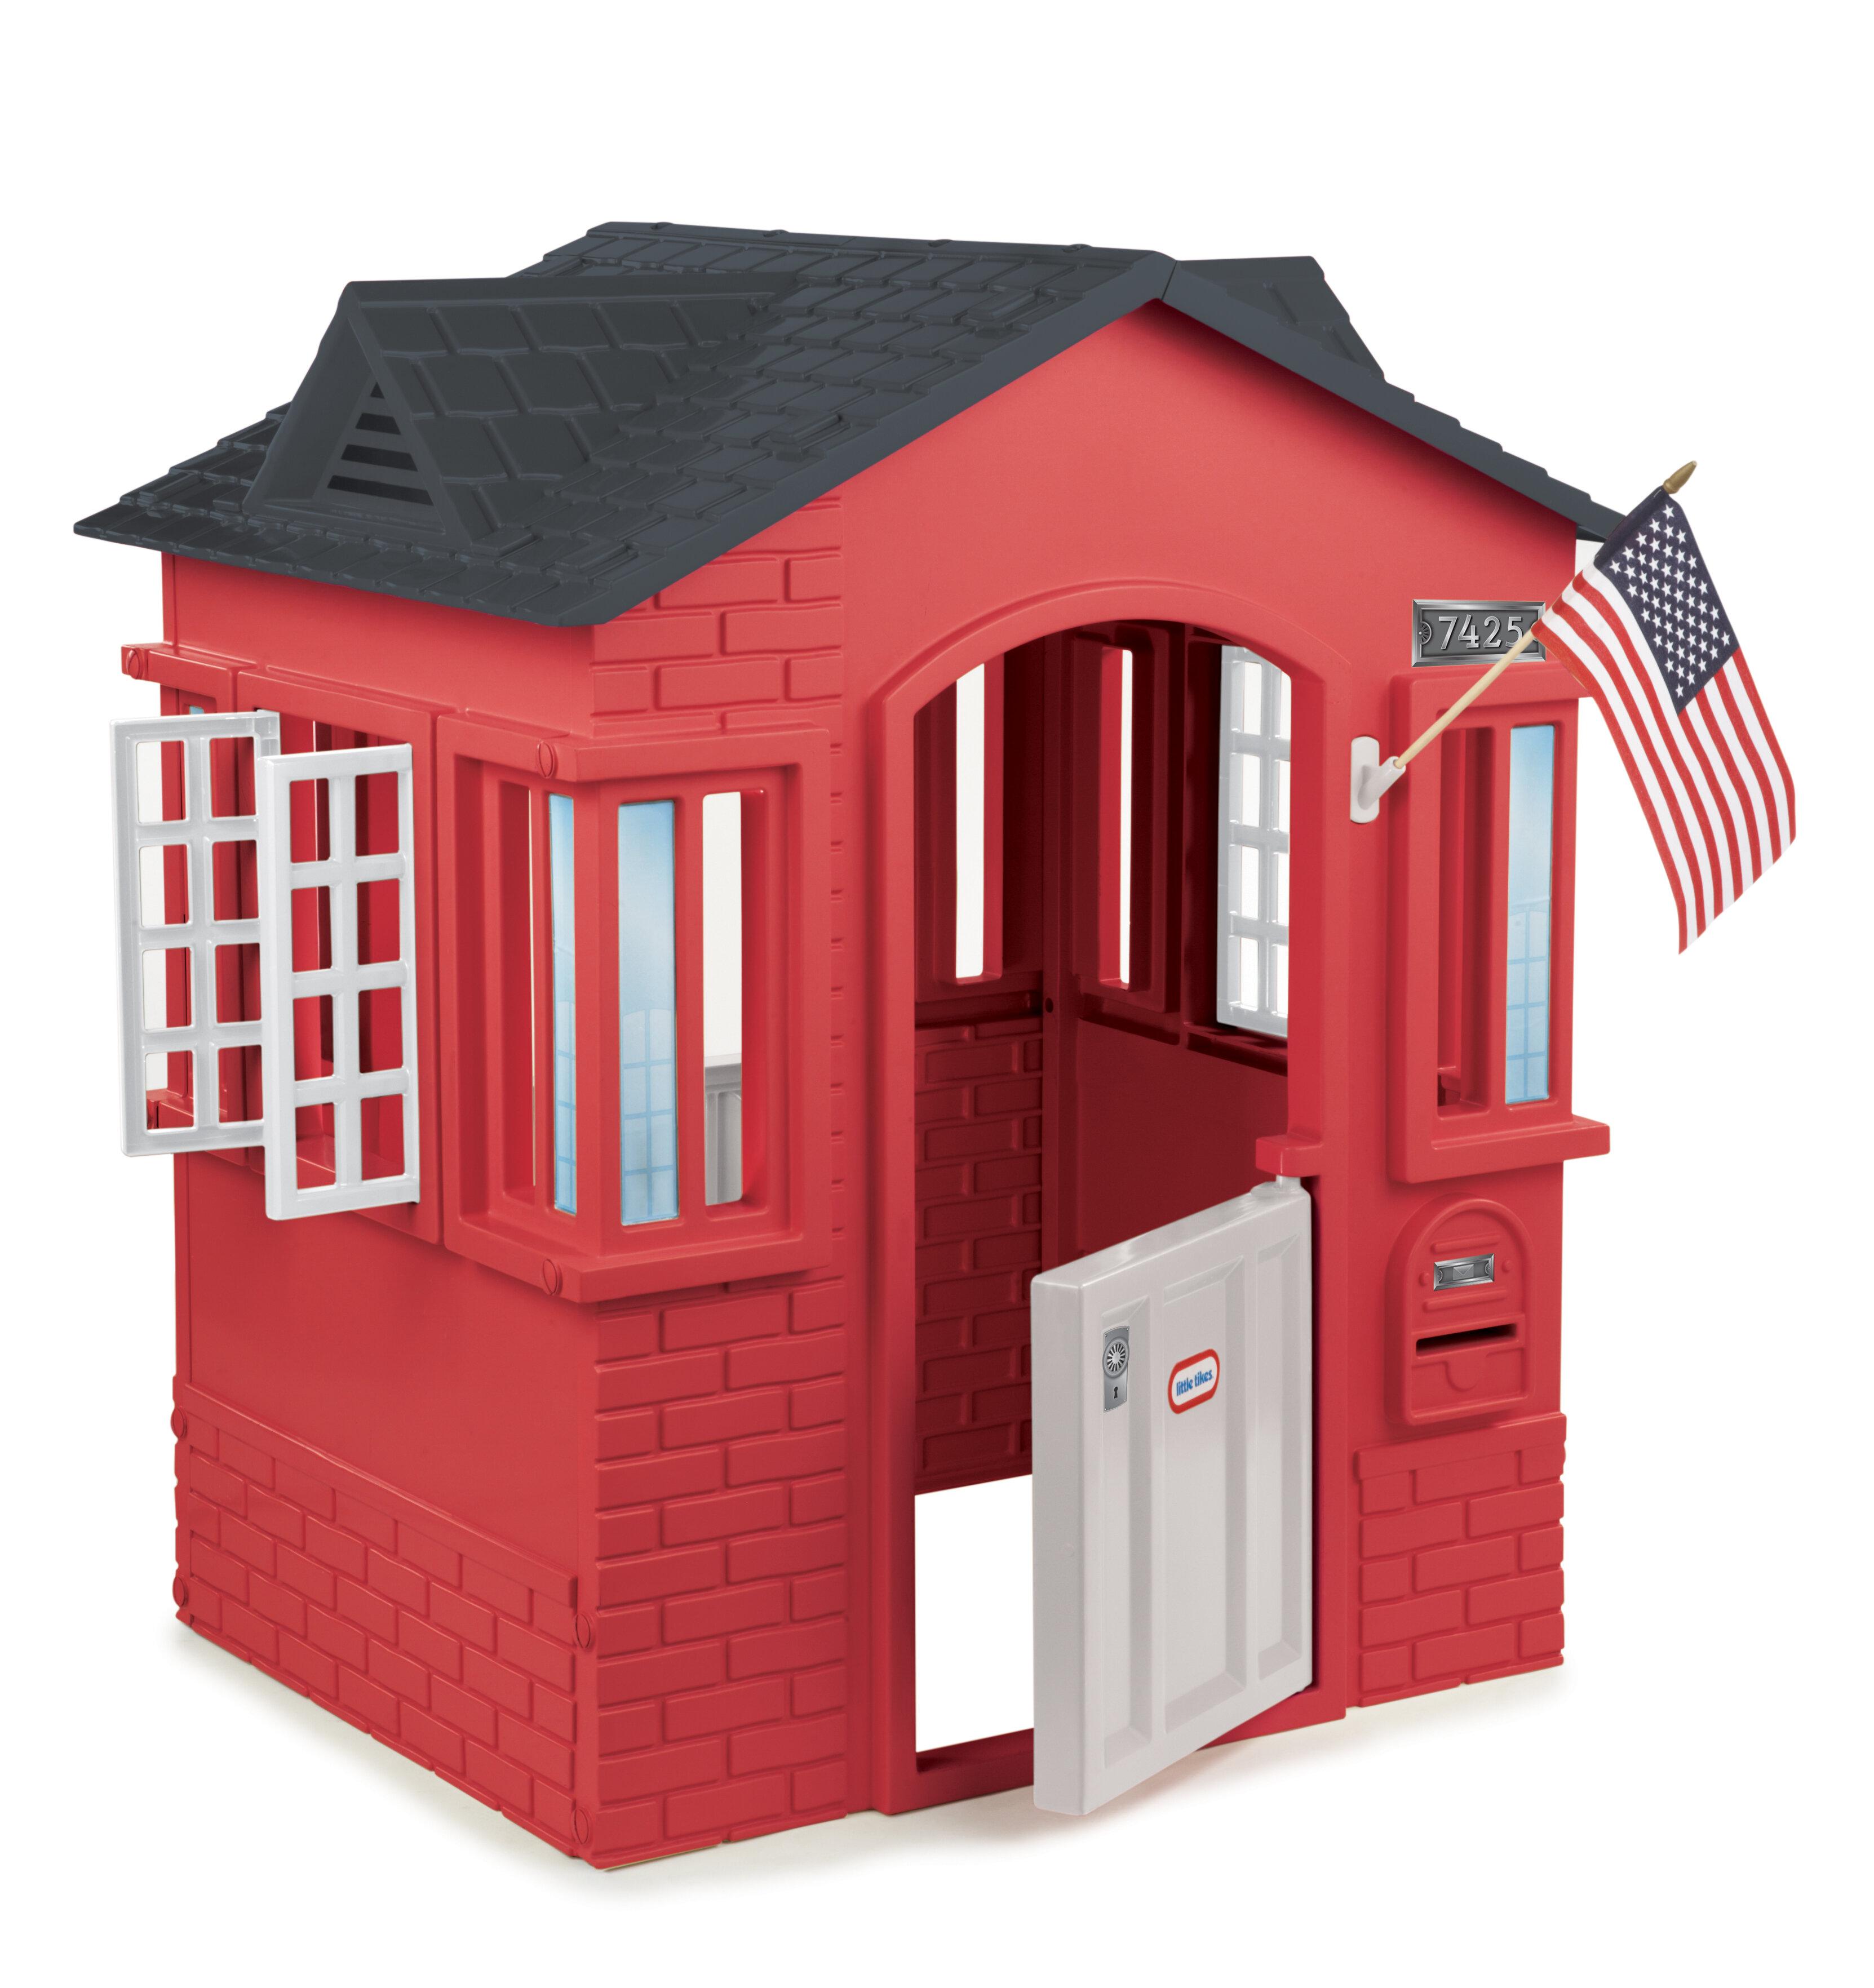 Excellent Little Tikes Cape Cottage 3 56 X 2 92 Playhouse Reviews Download Free Architecture Designs Scobabritishbridgeorg